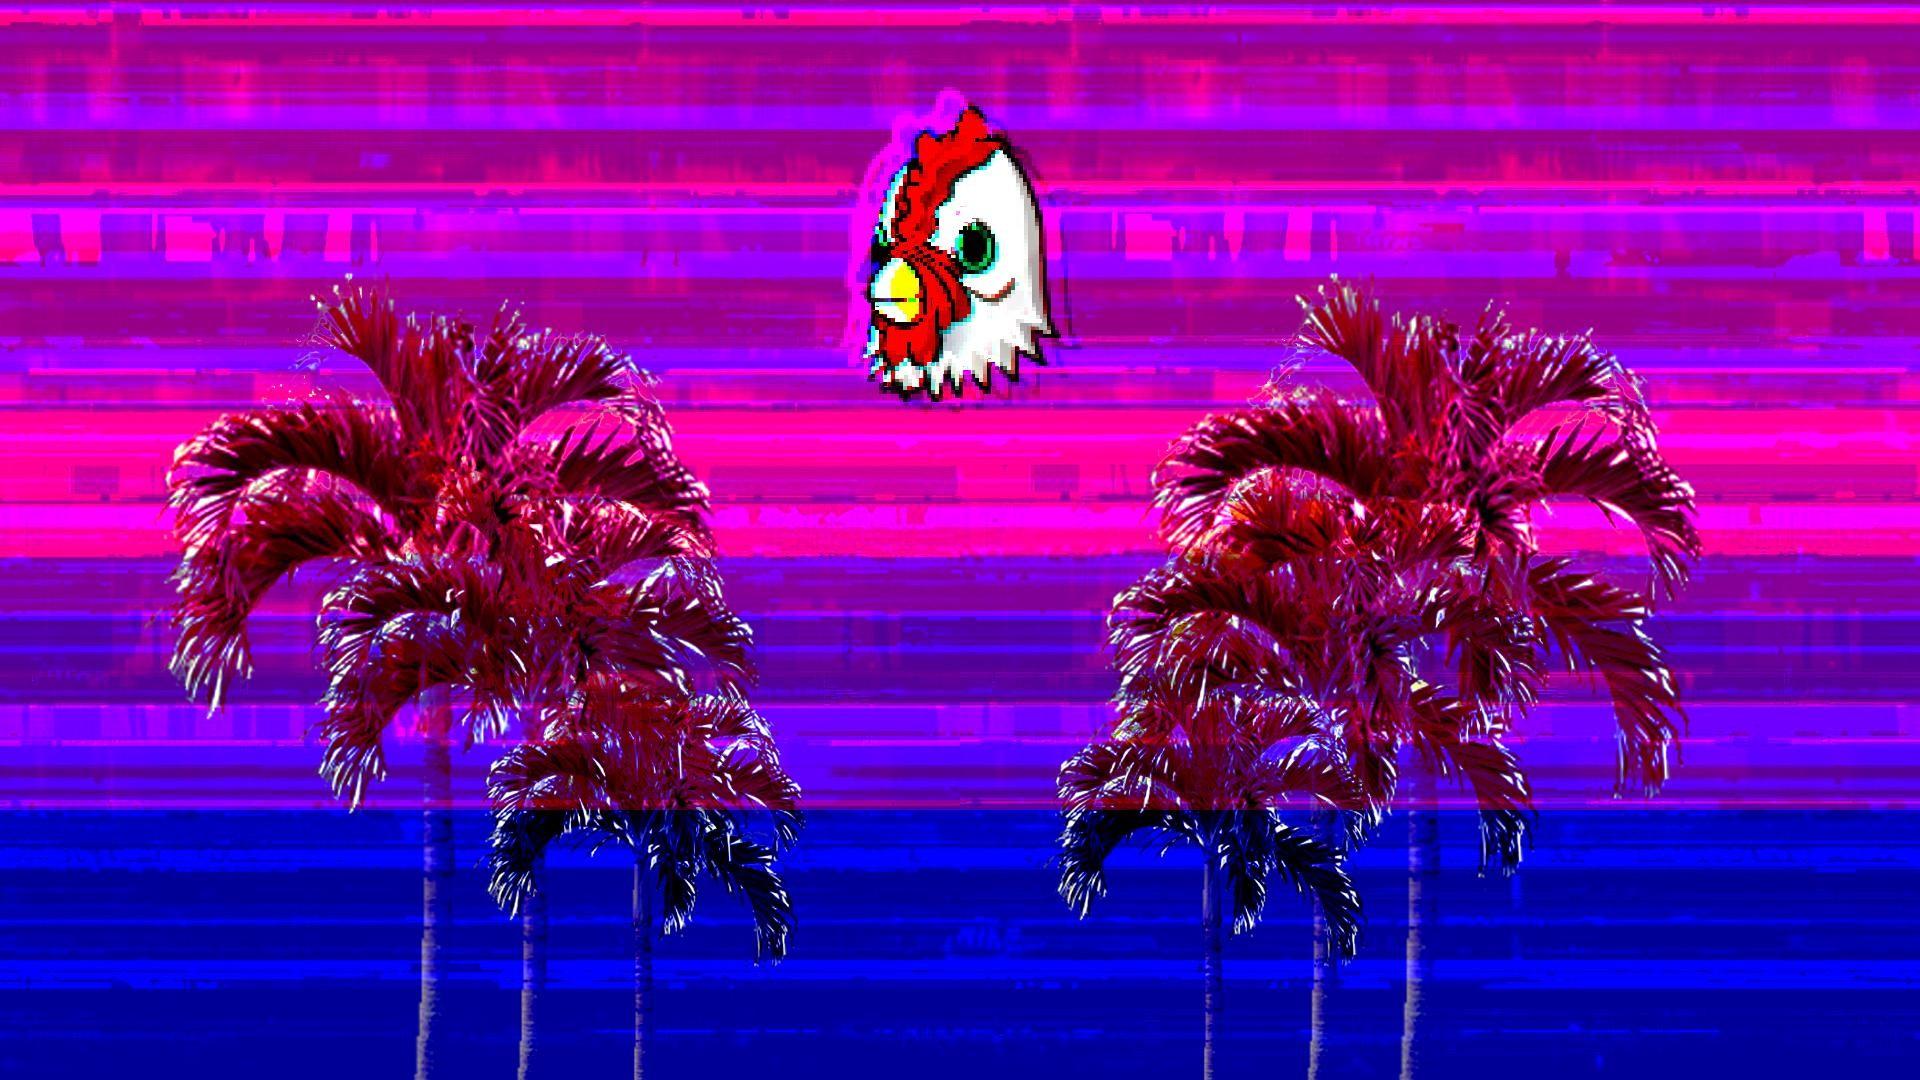 Hotline Miami Background ·① Download Free Amazing High